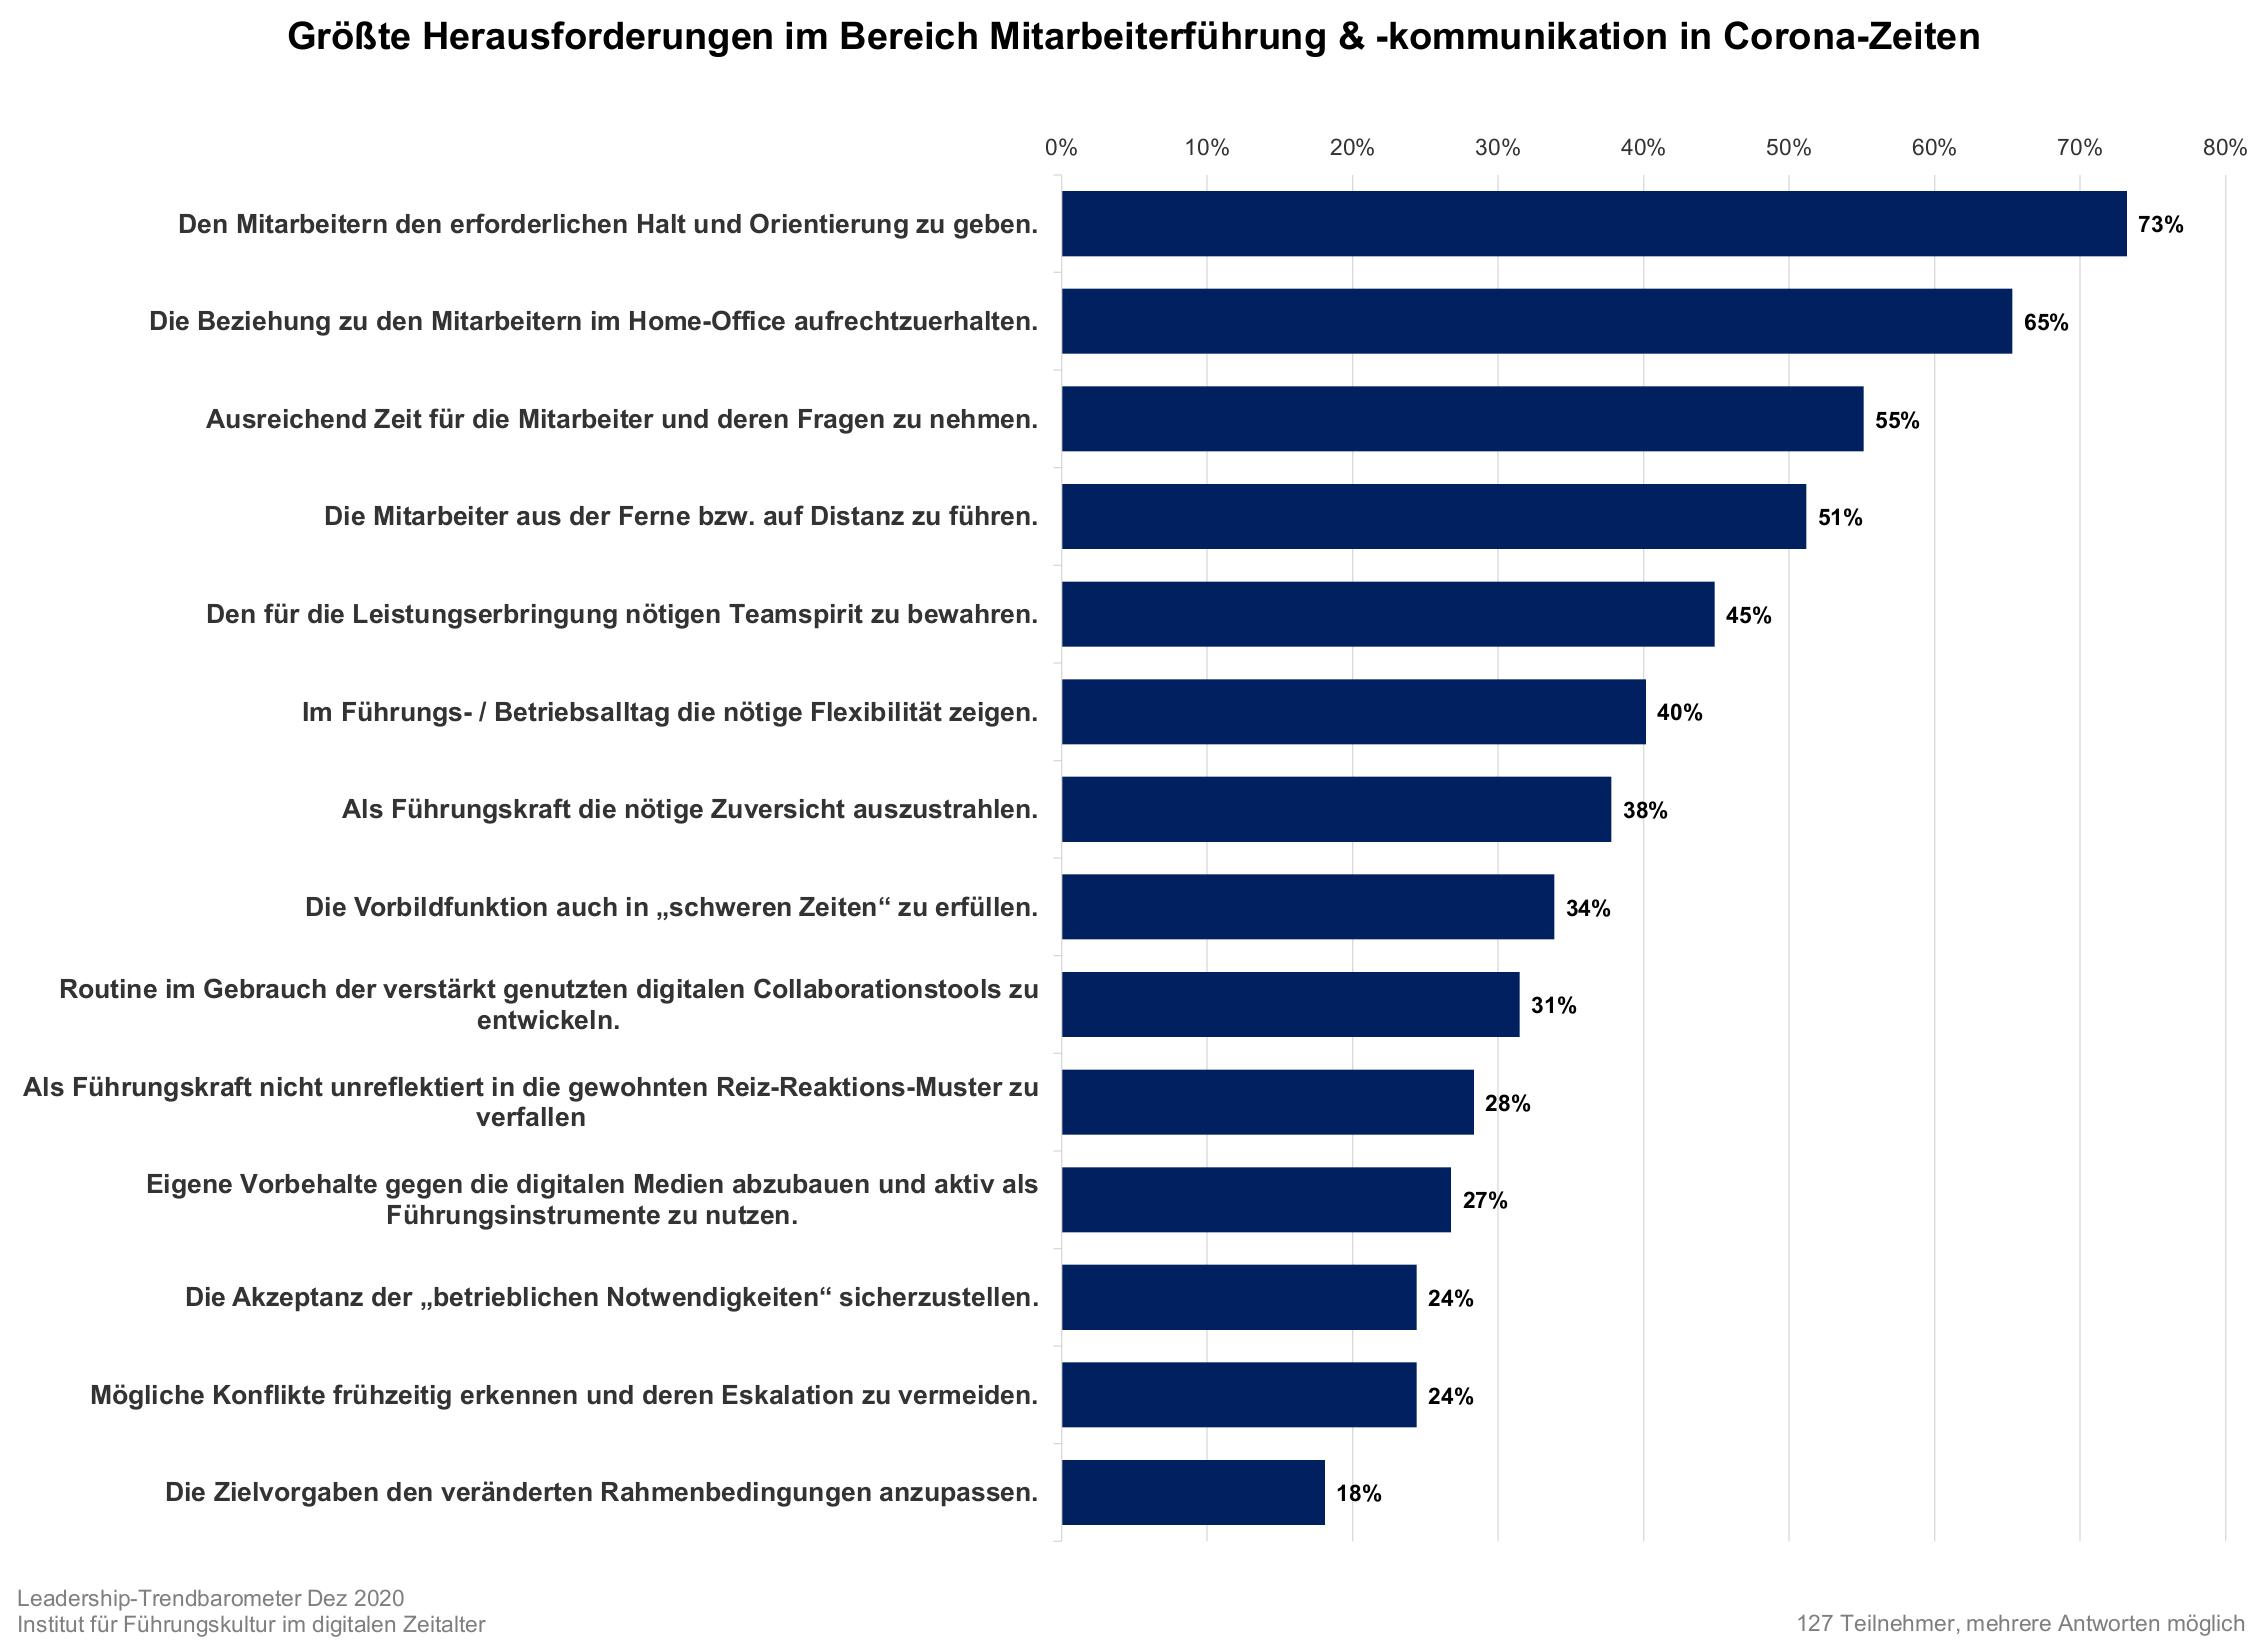 Mel_Trendbarometer-Führung-Corona-Grafik1